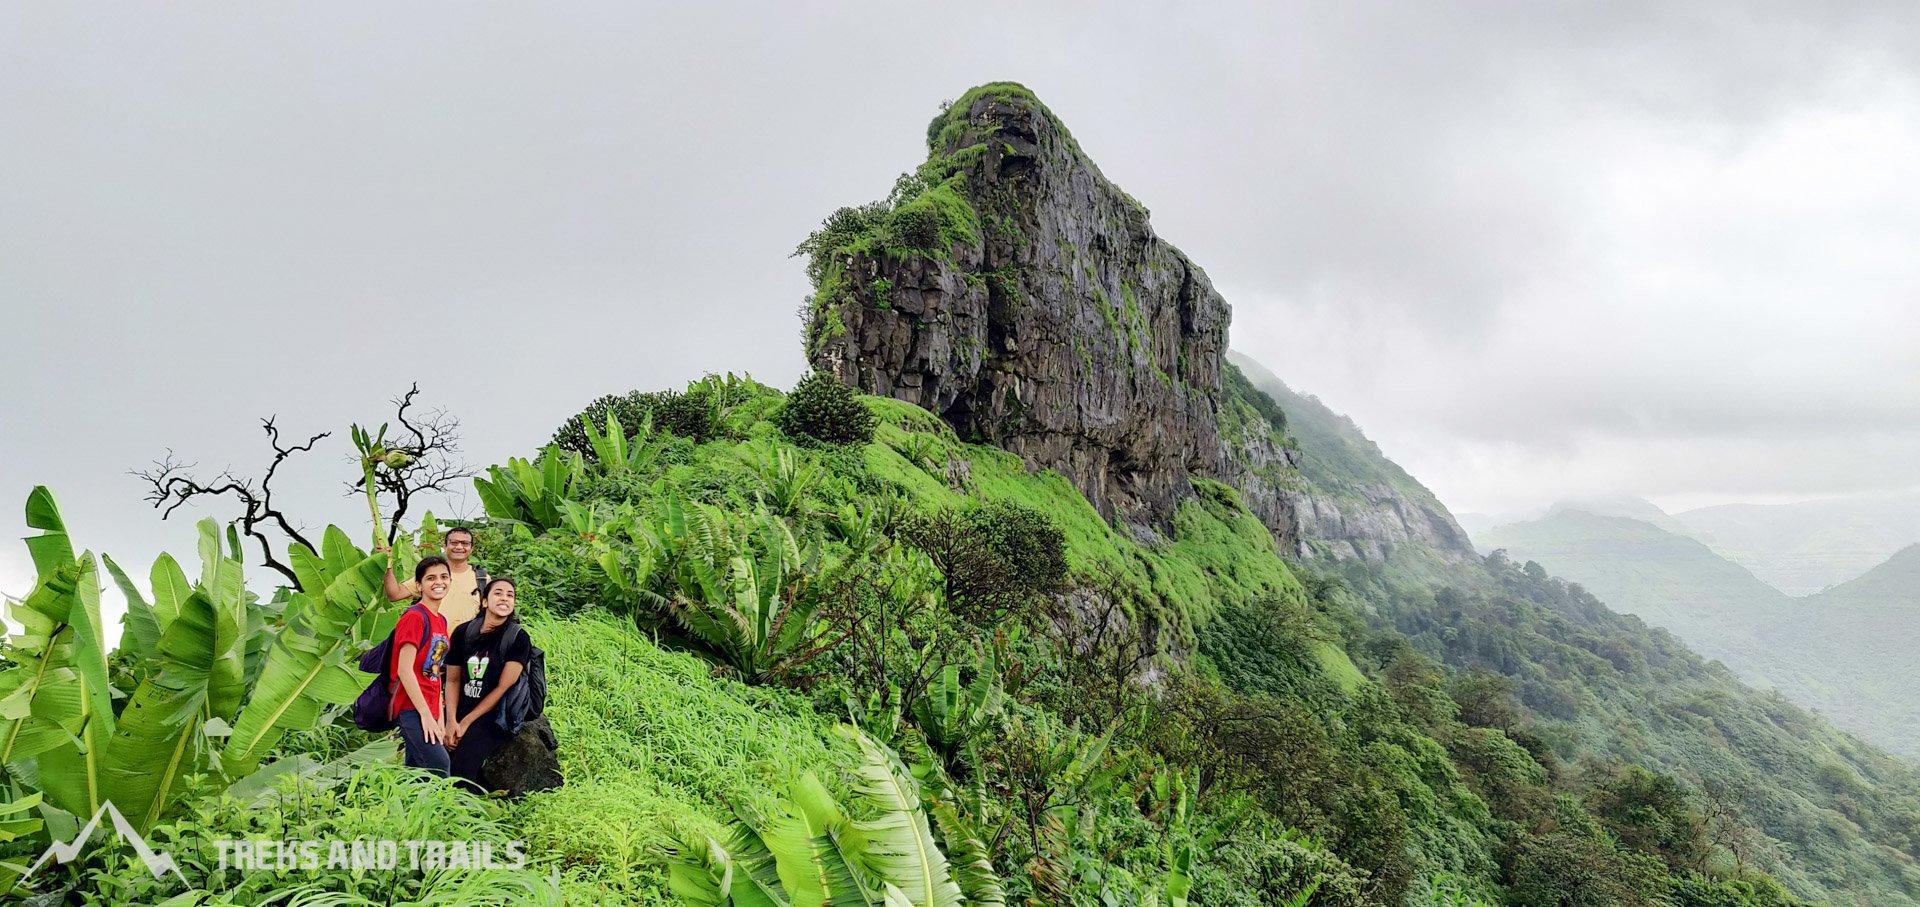 Monsoon Trekking Tips